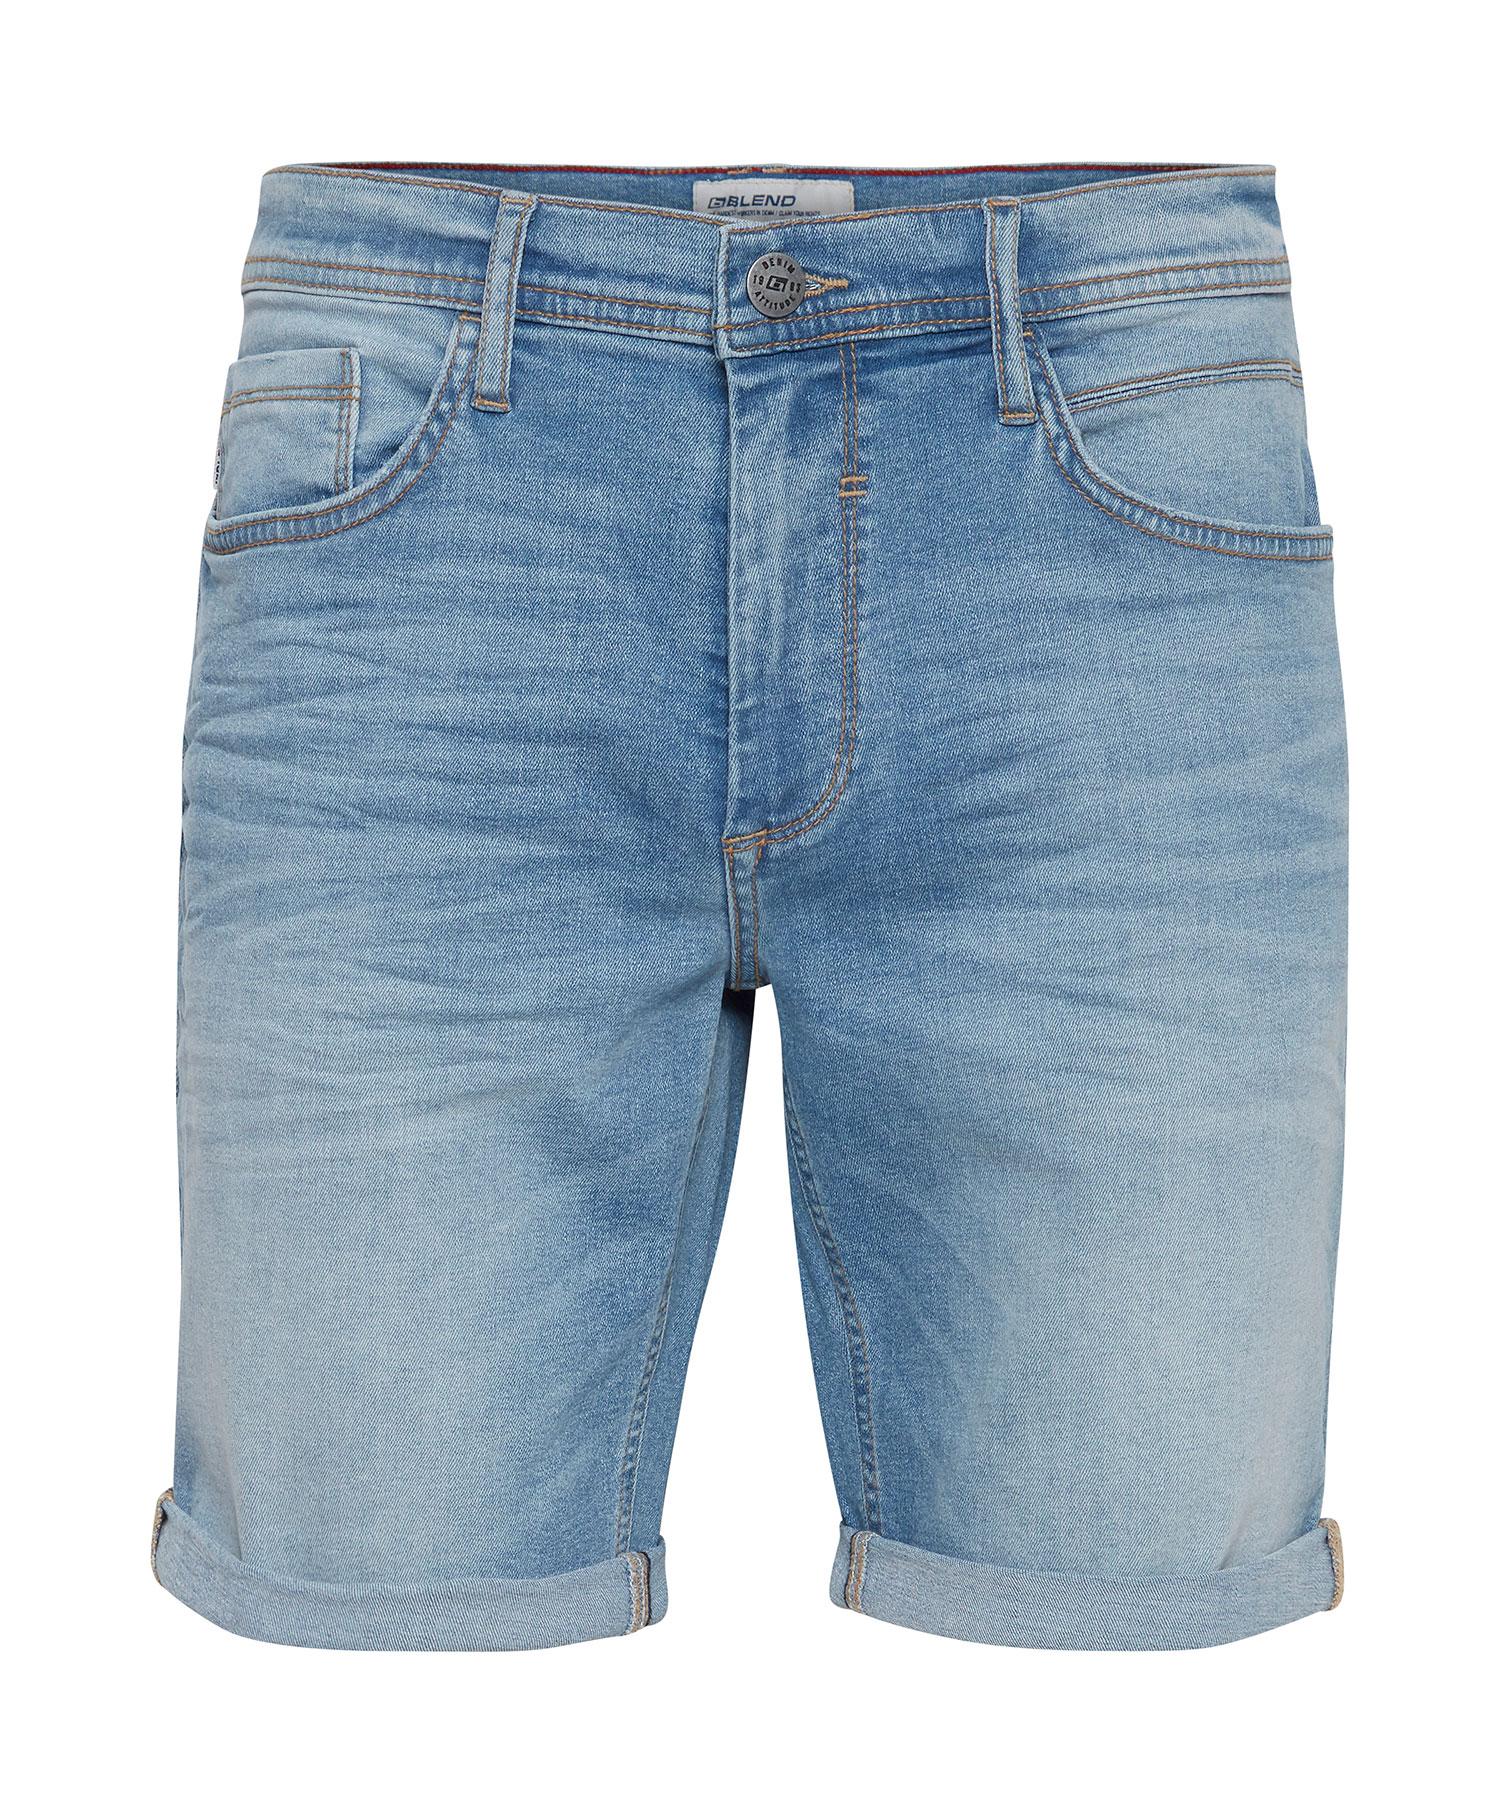 Blend twisterfit shorts